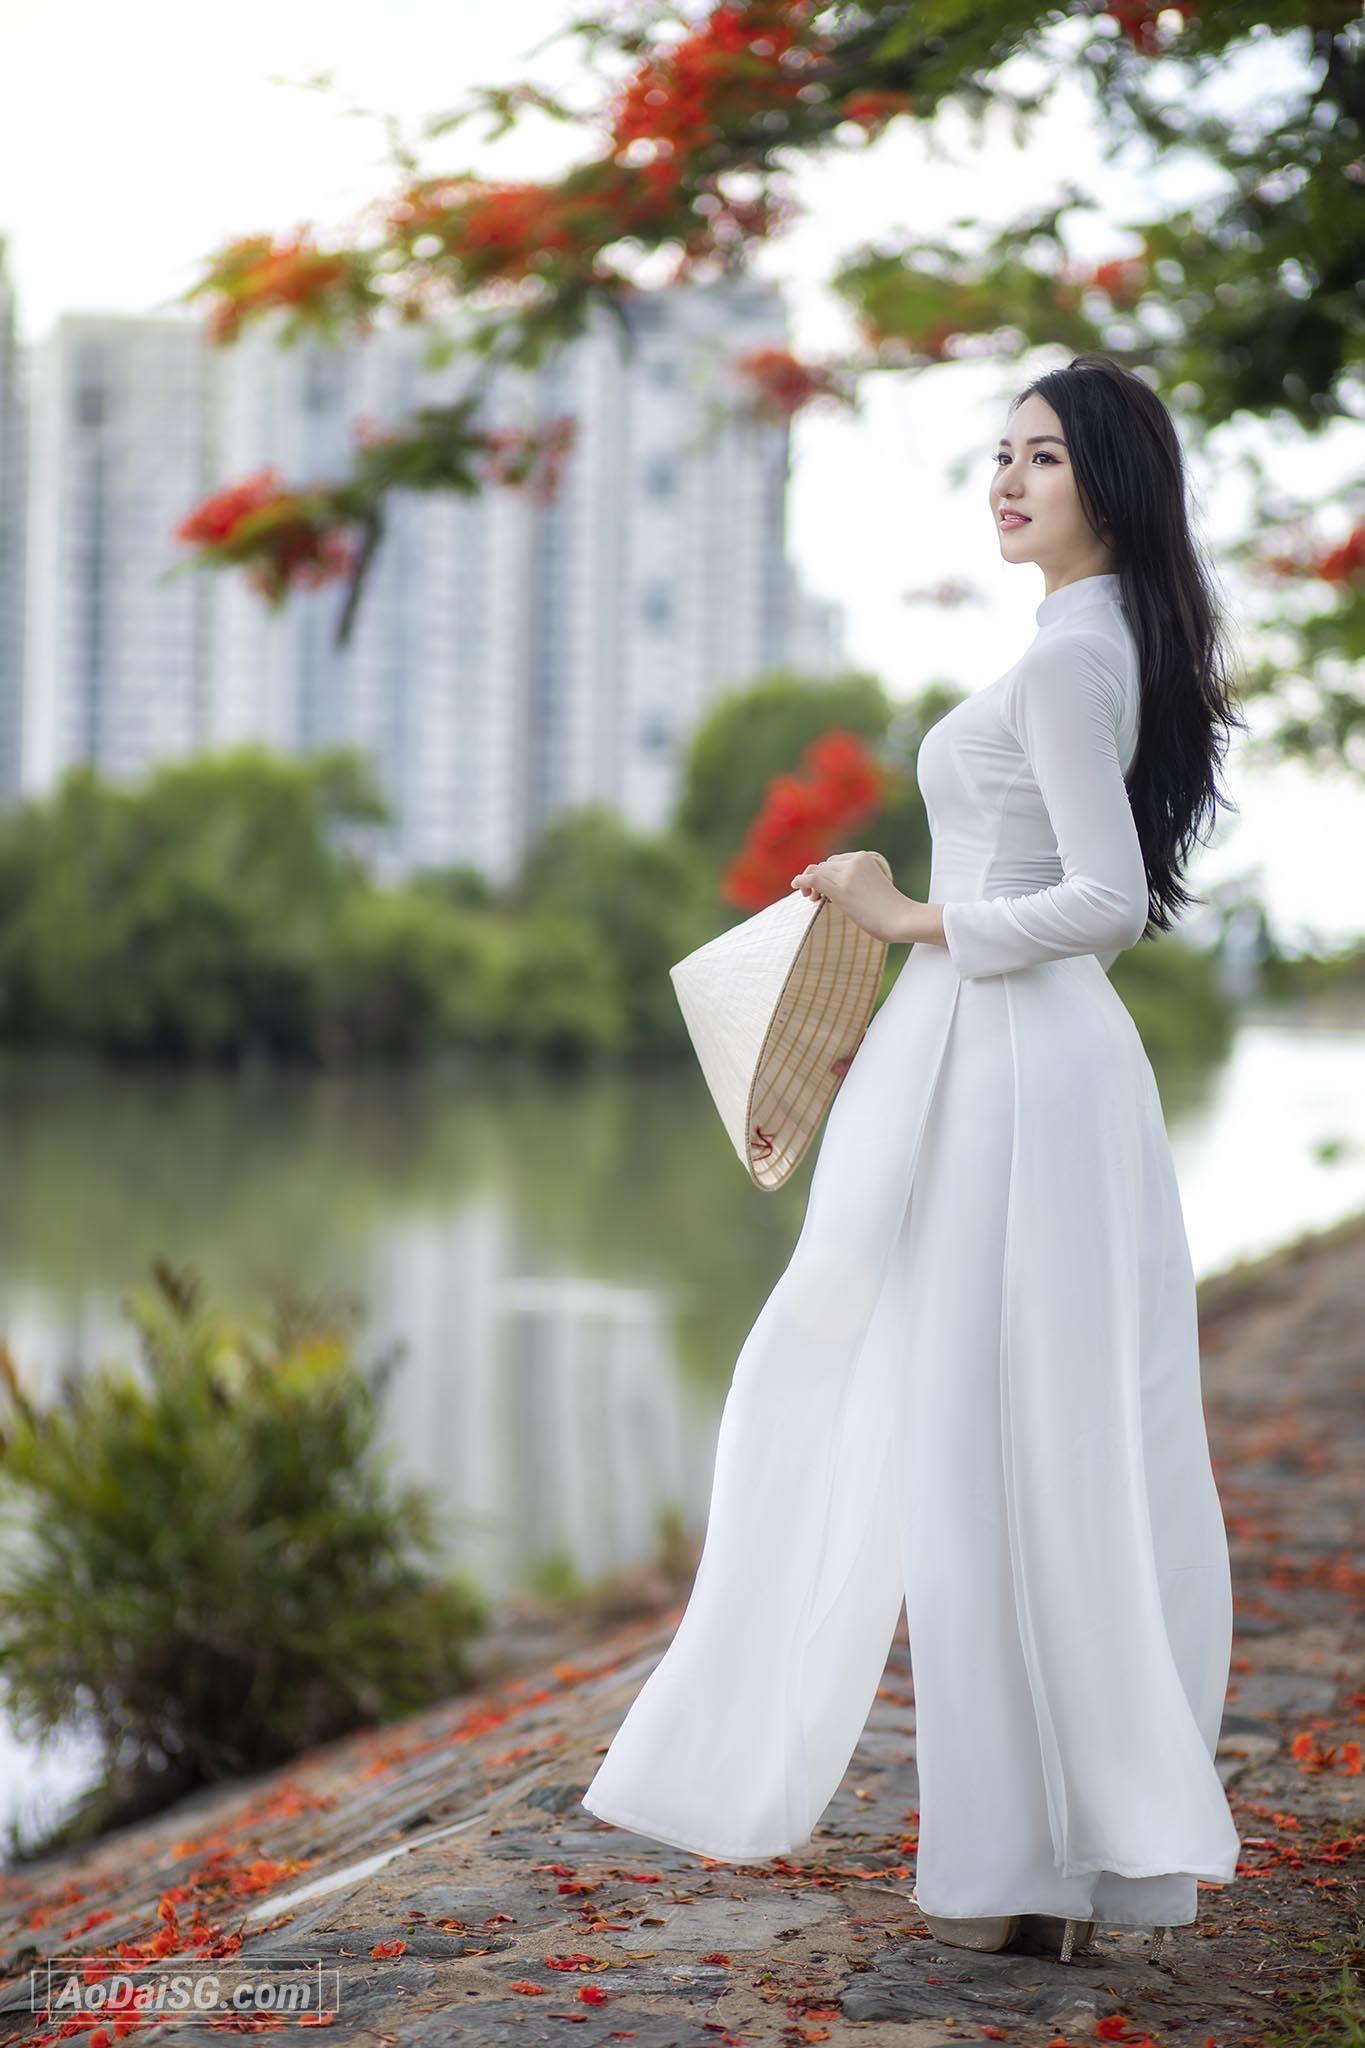 Chup hinh Ao Dai Hoa Phuong tai tphcm